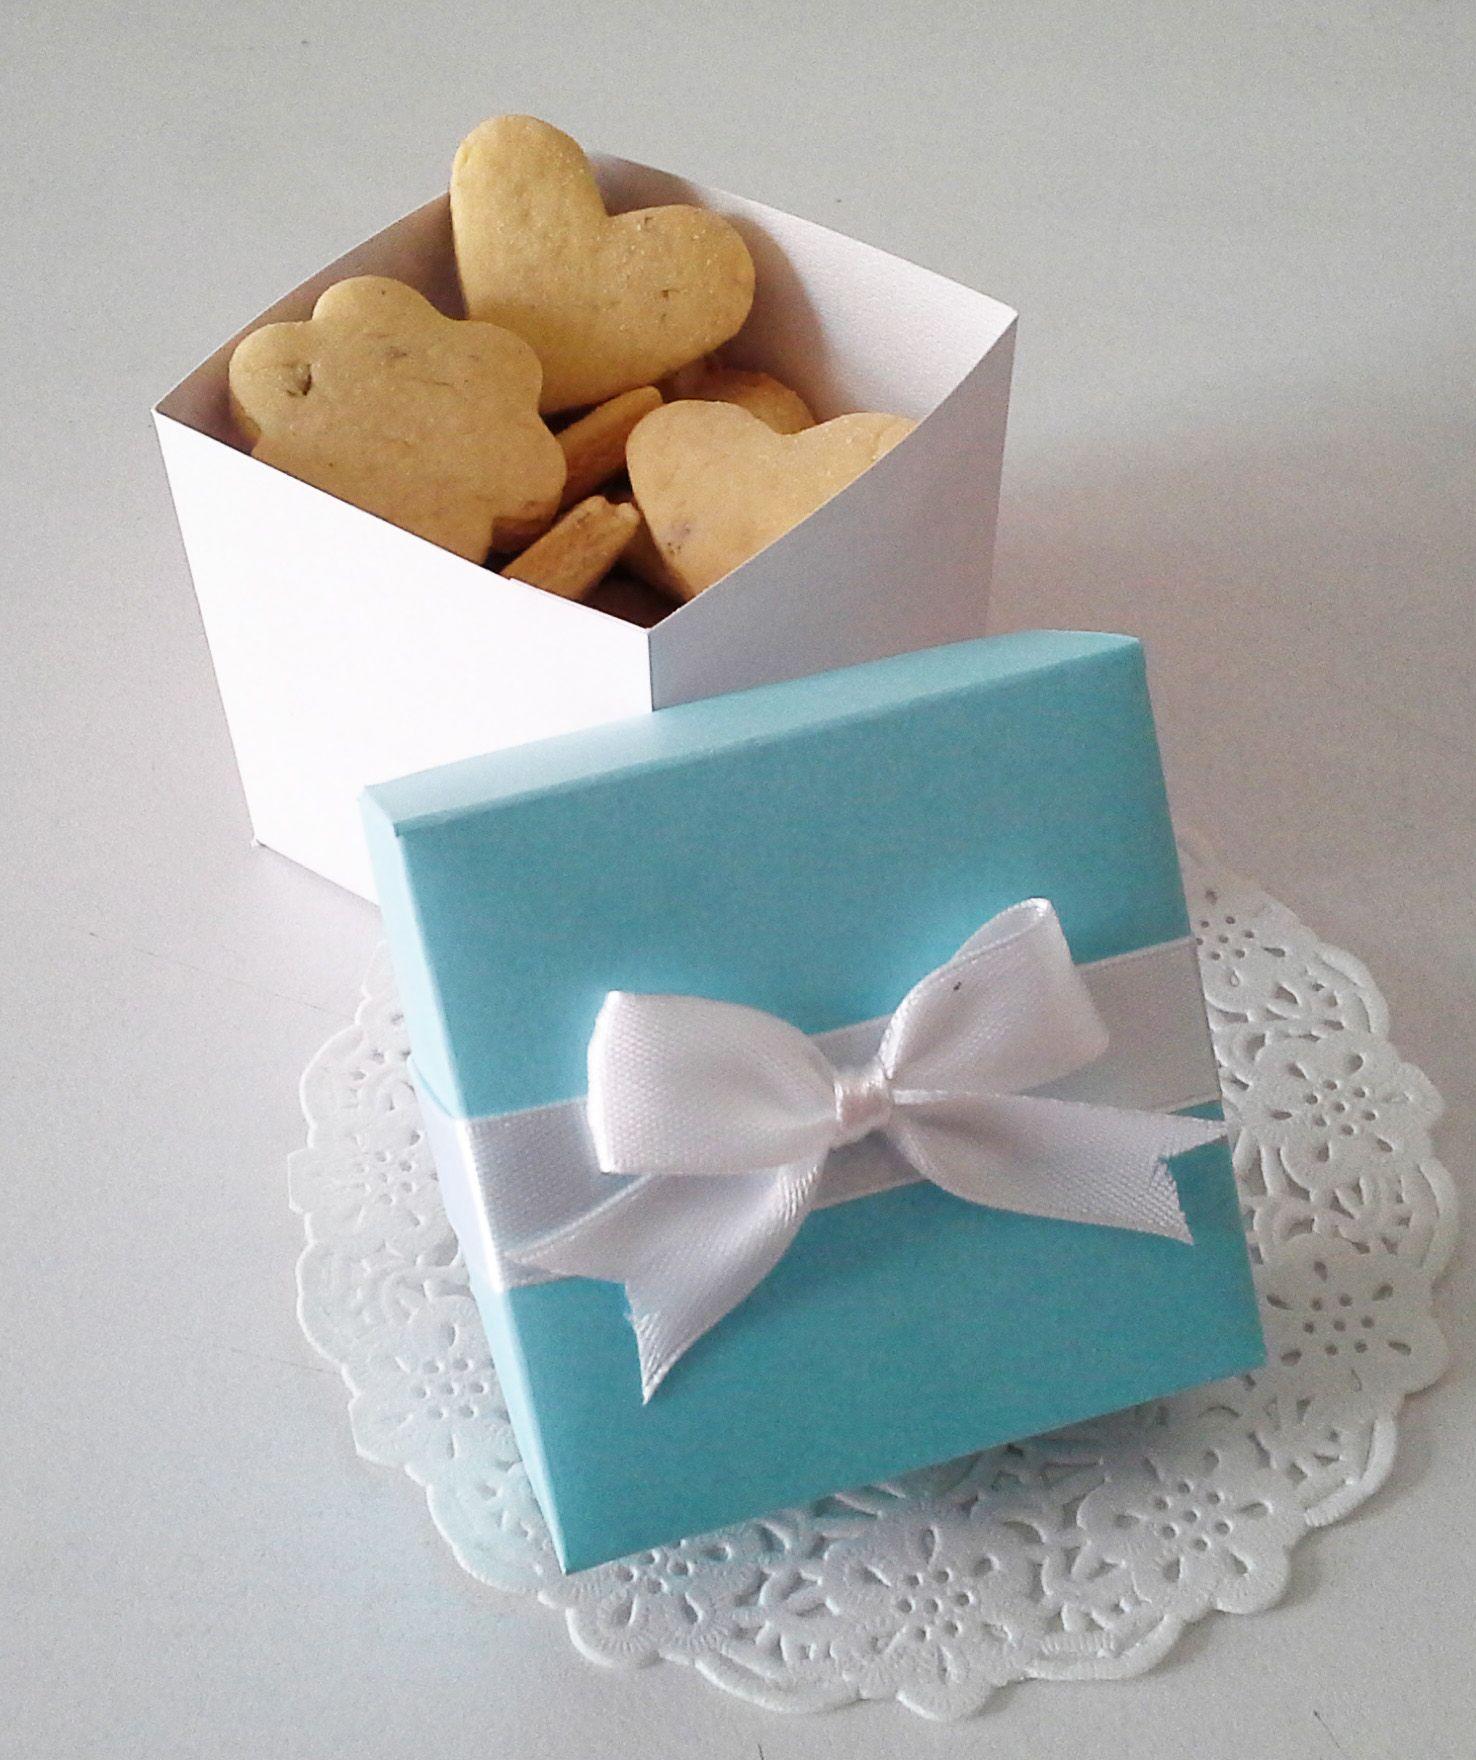 Caja con 100g de galletas caseras | Recetas comida | Pinterest ...